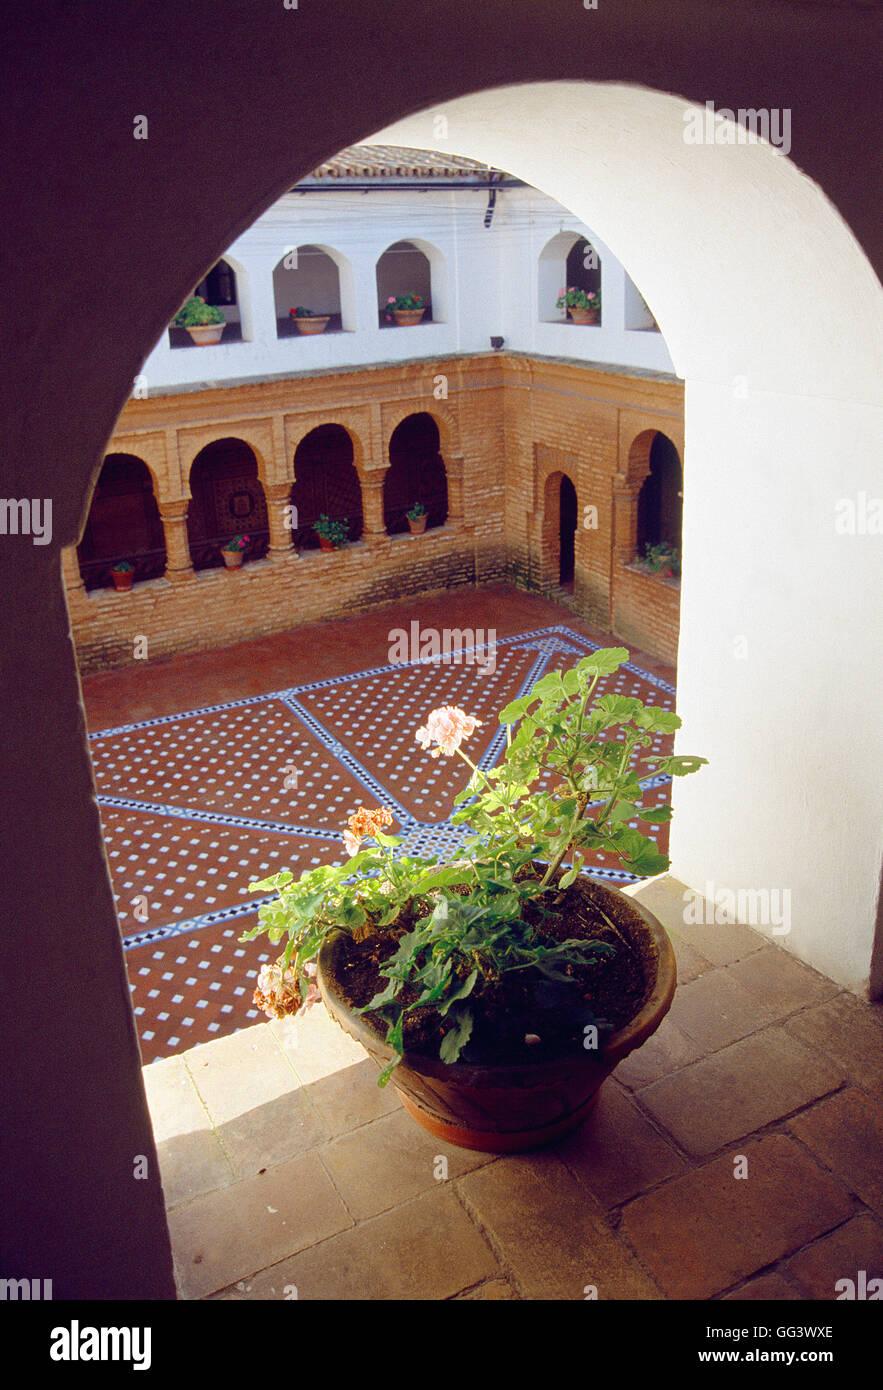 Im Mudéjar-Stil Kreuzgang. Kloster La Rabida, Huelva, Spanien. Stockbild